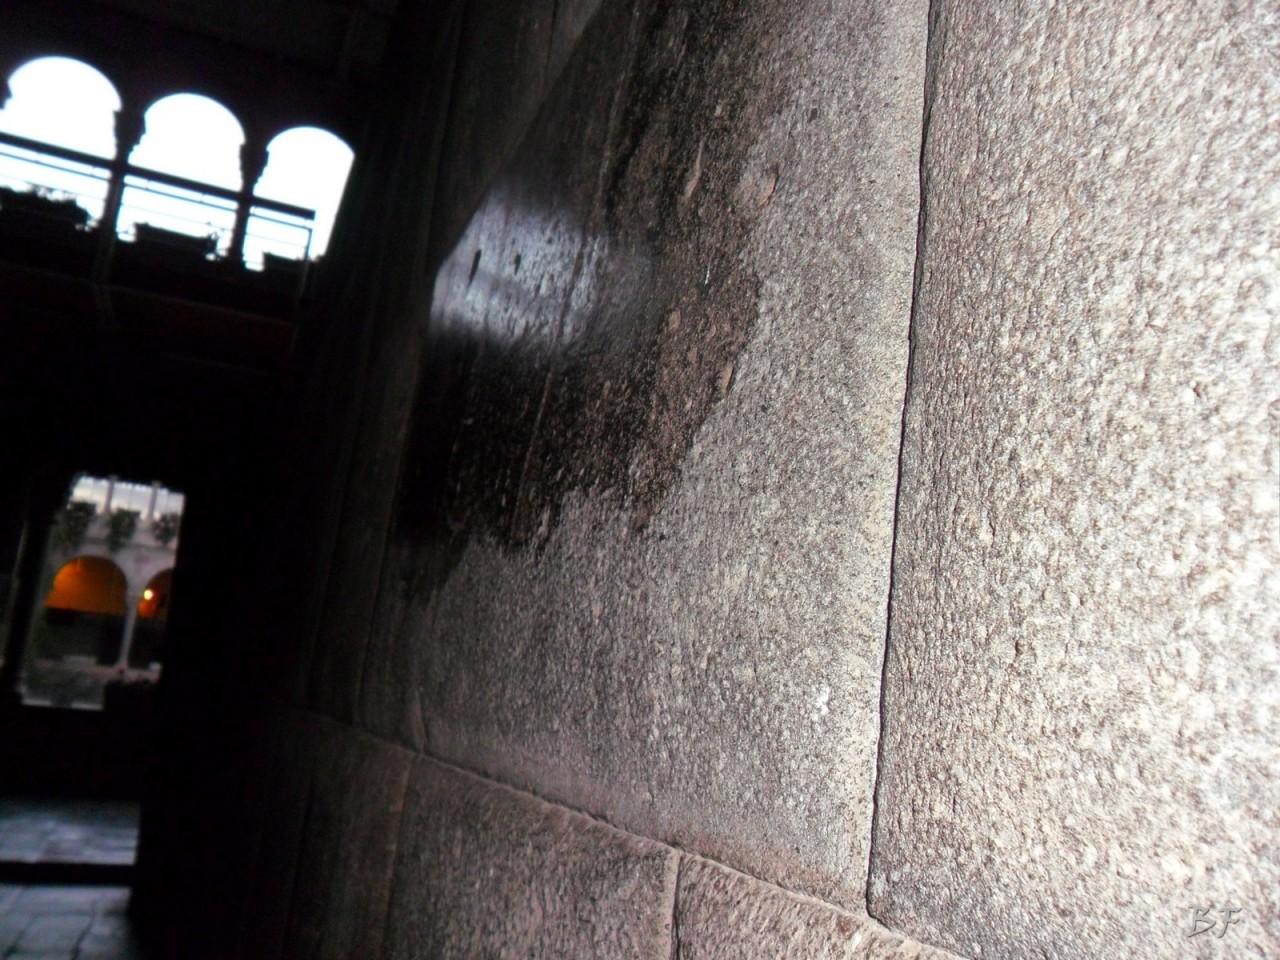 1_Mura-Poligonali-Megaliti-Tempio-Coricancha-Cusco-Perù-11